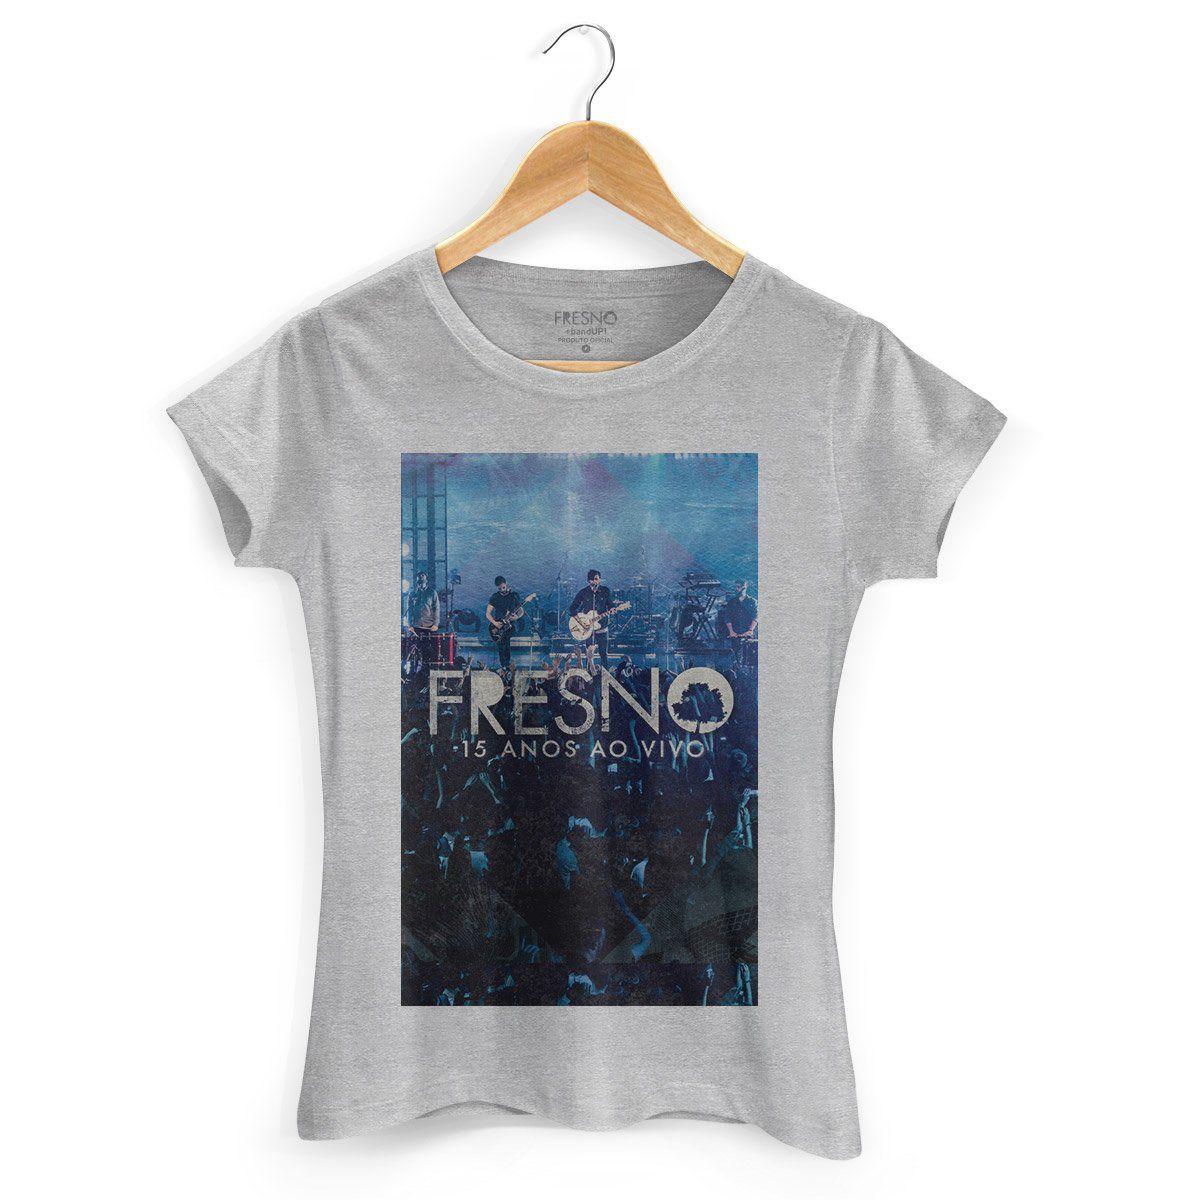 Camiseta Feminina Fresno Capa